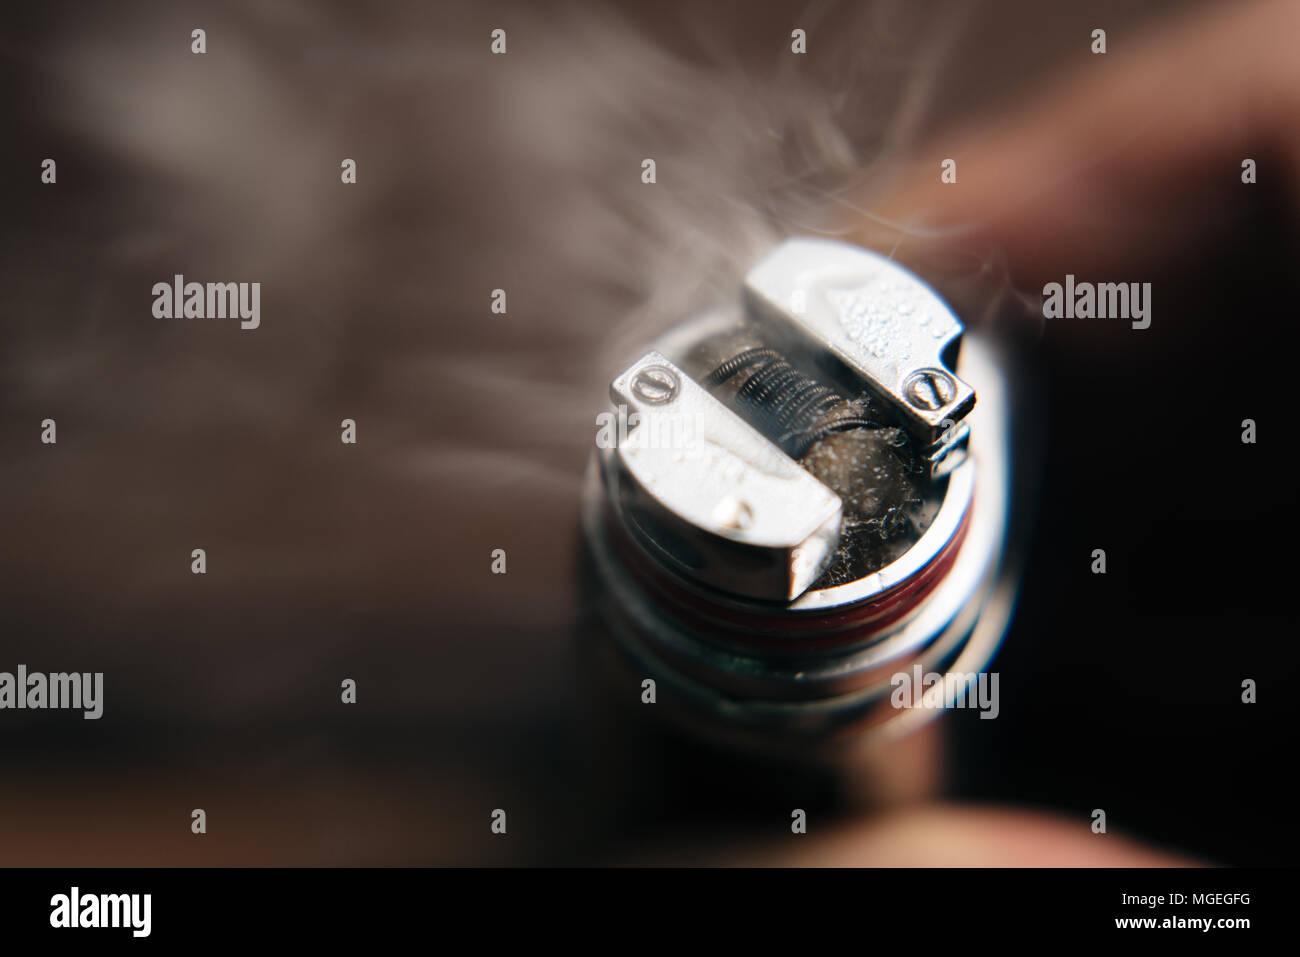 close up of a vape (e-cigarette) with vapor - Stock Image